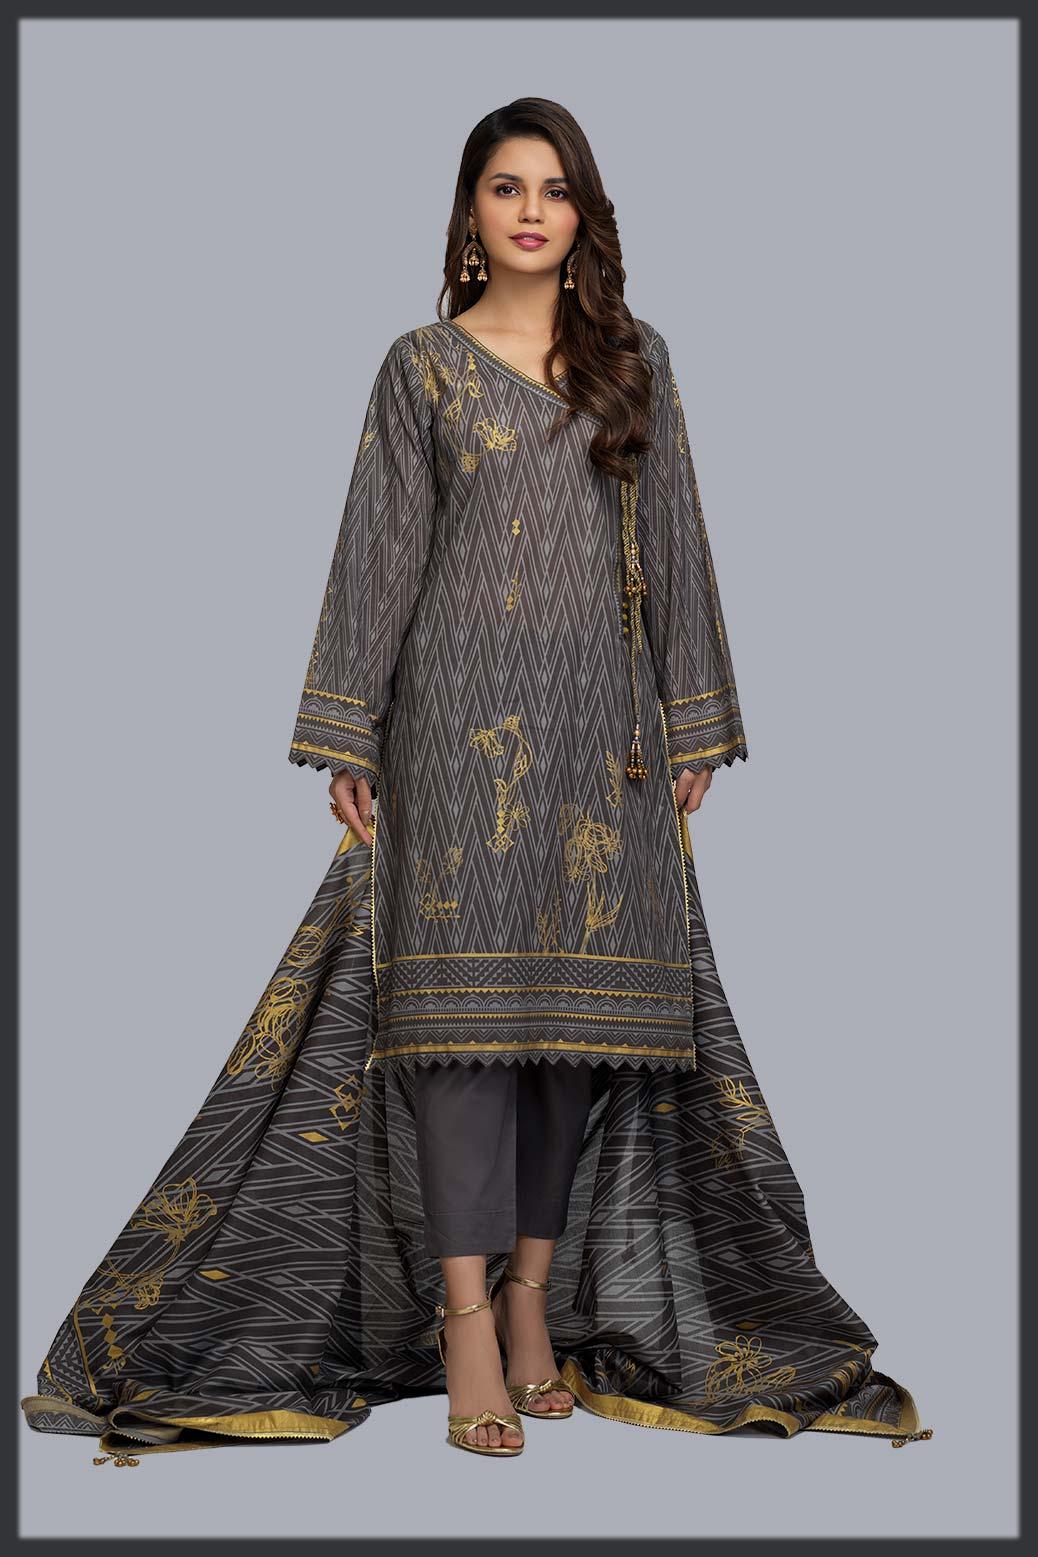 dazzling pakistani eid dresses for women